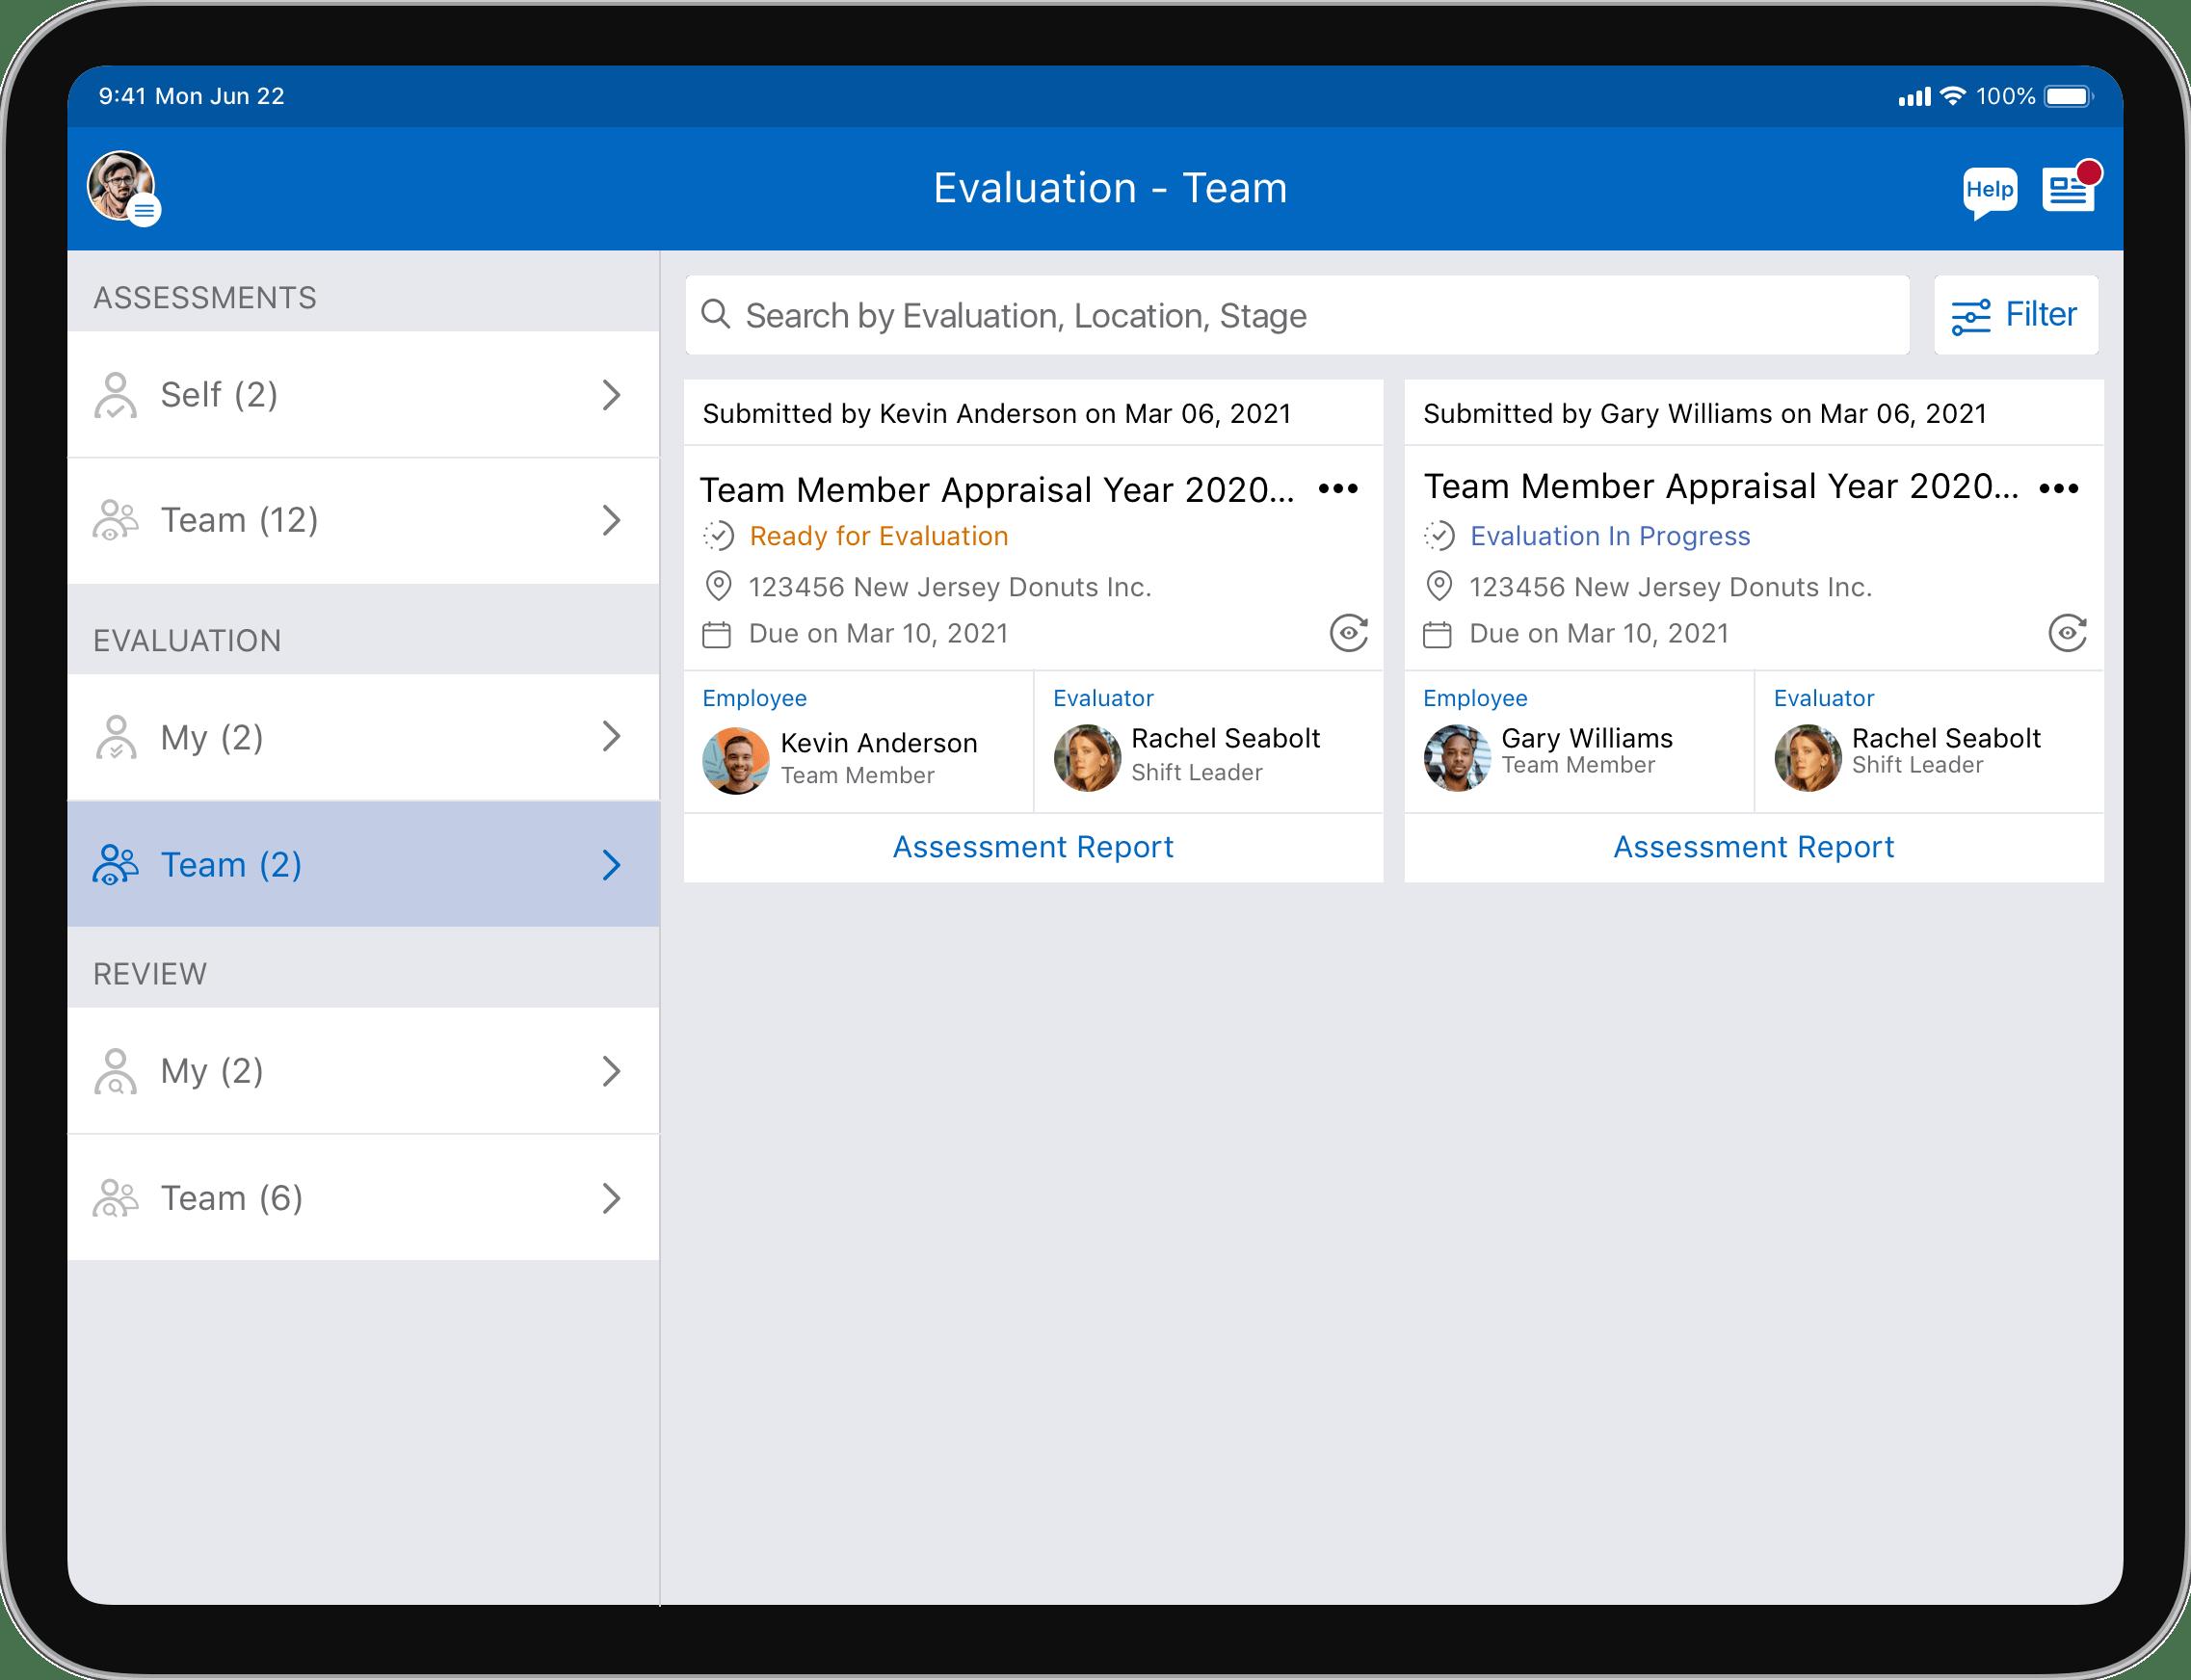 https://www.workpulse.com/wp-content/uploads/2021/07/Team-Evaluation.png